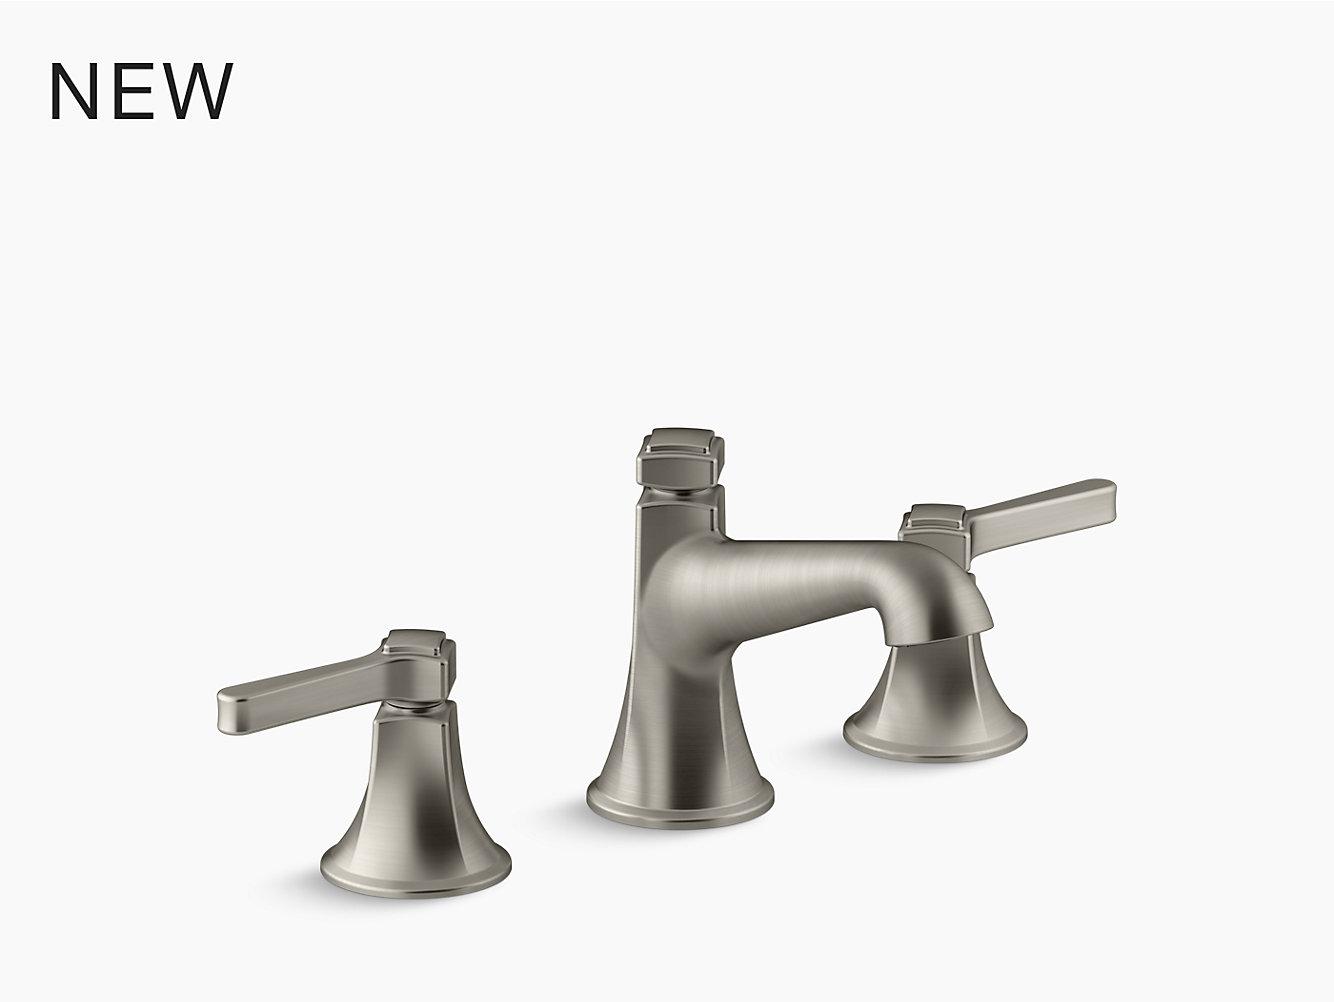 mistos kitchen sink faucet with sidespray k r72508 kohler view larger